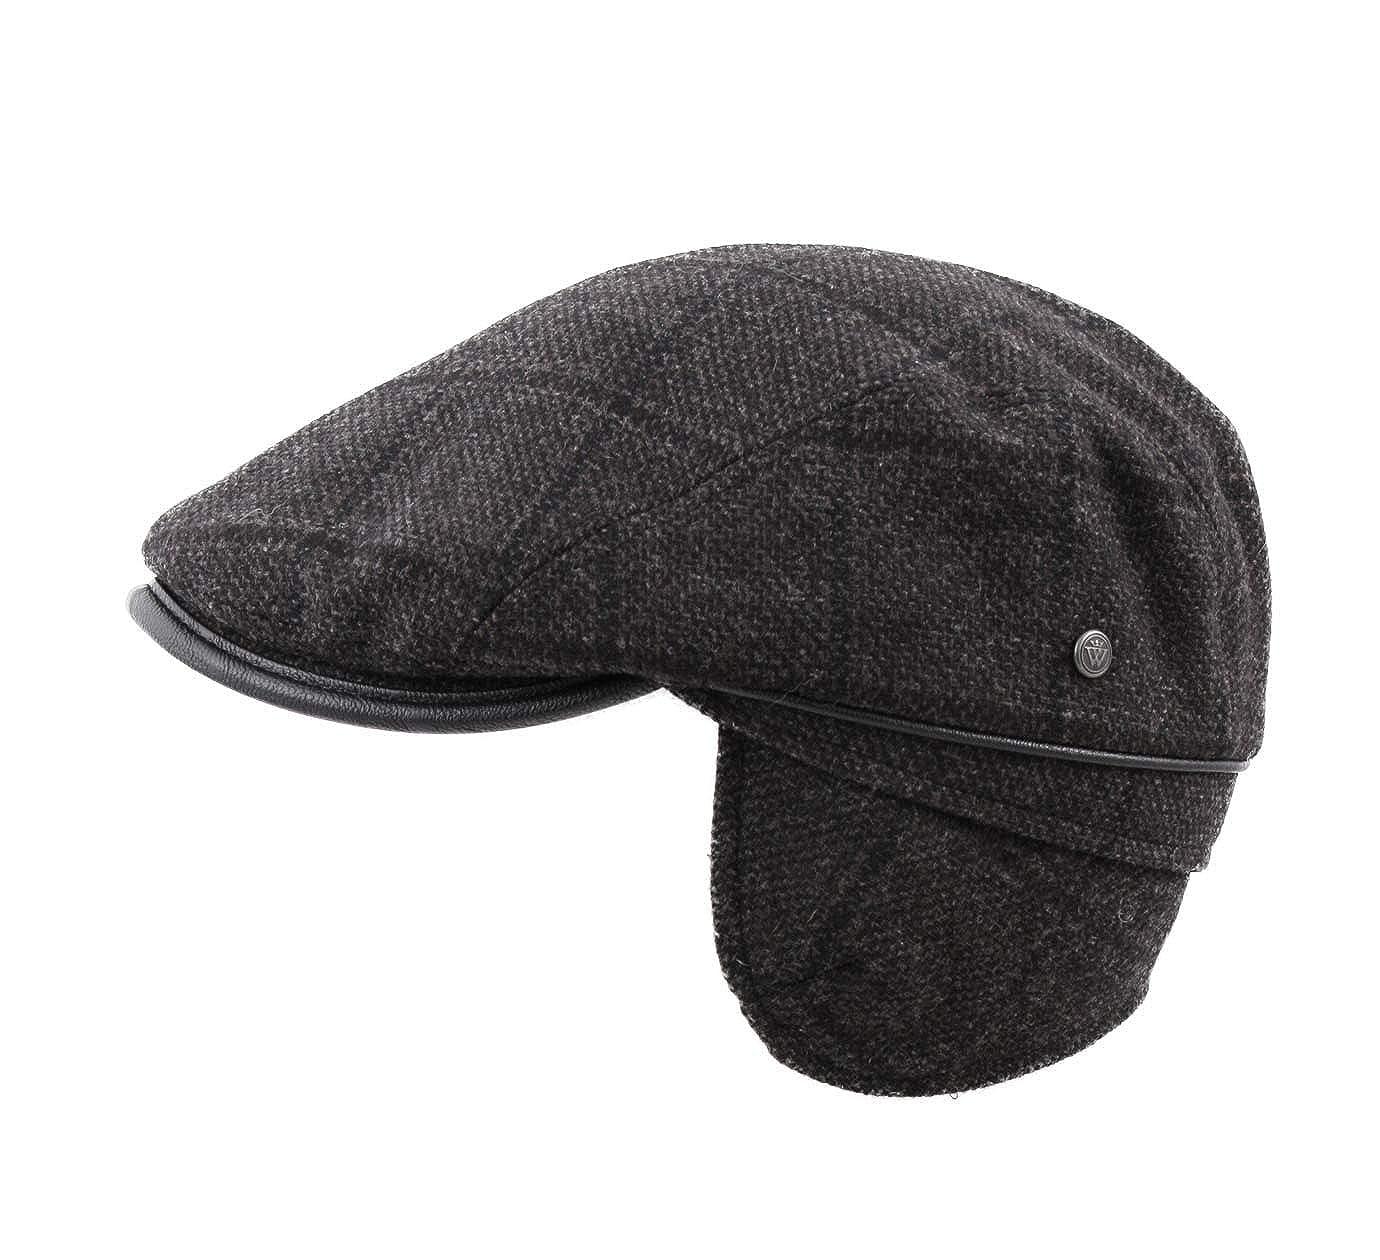 Wegener Mens Chollet Flat Cap